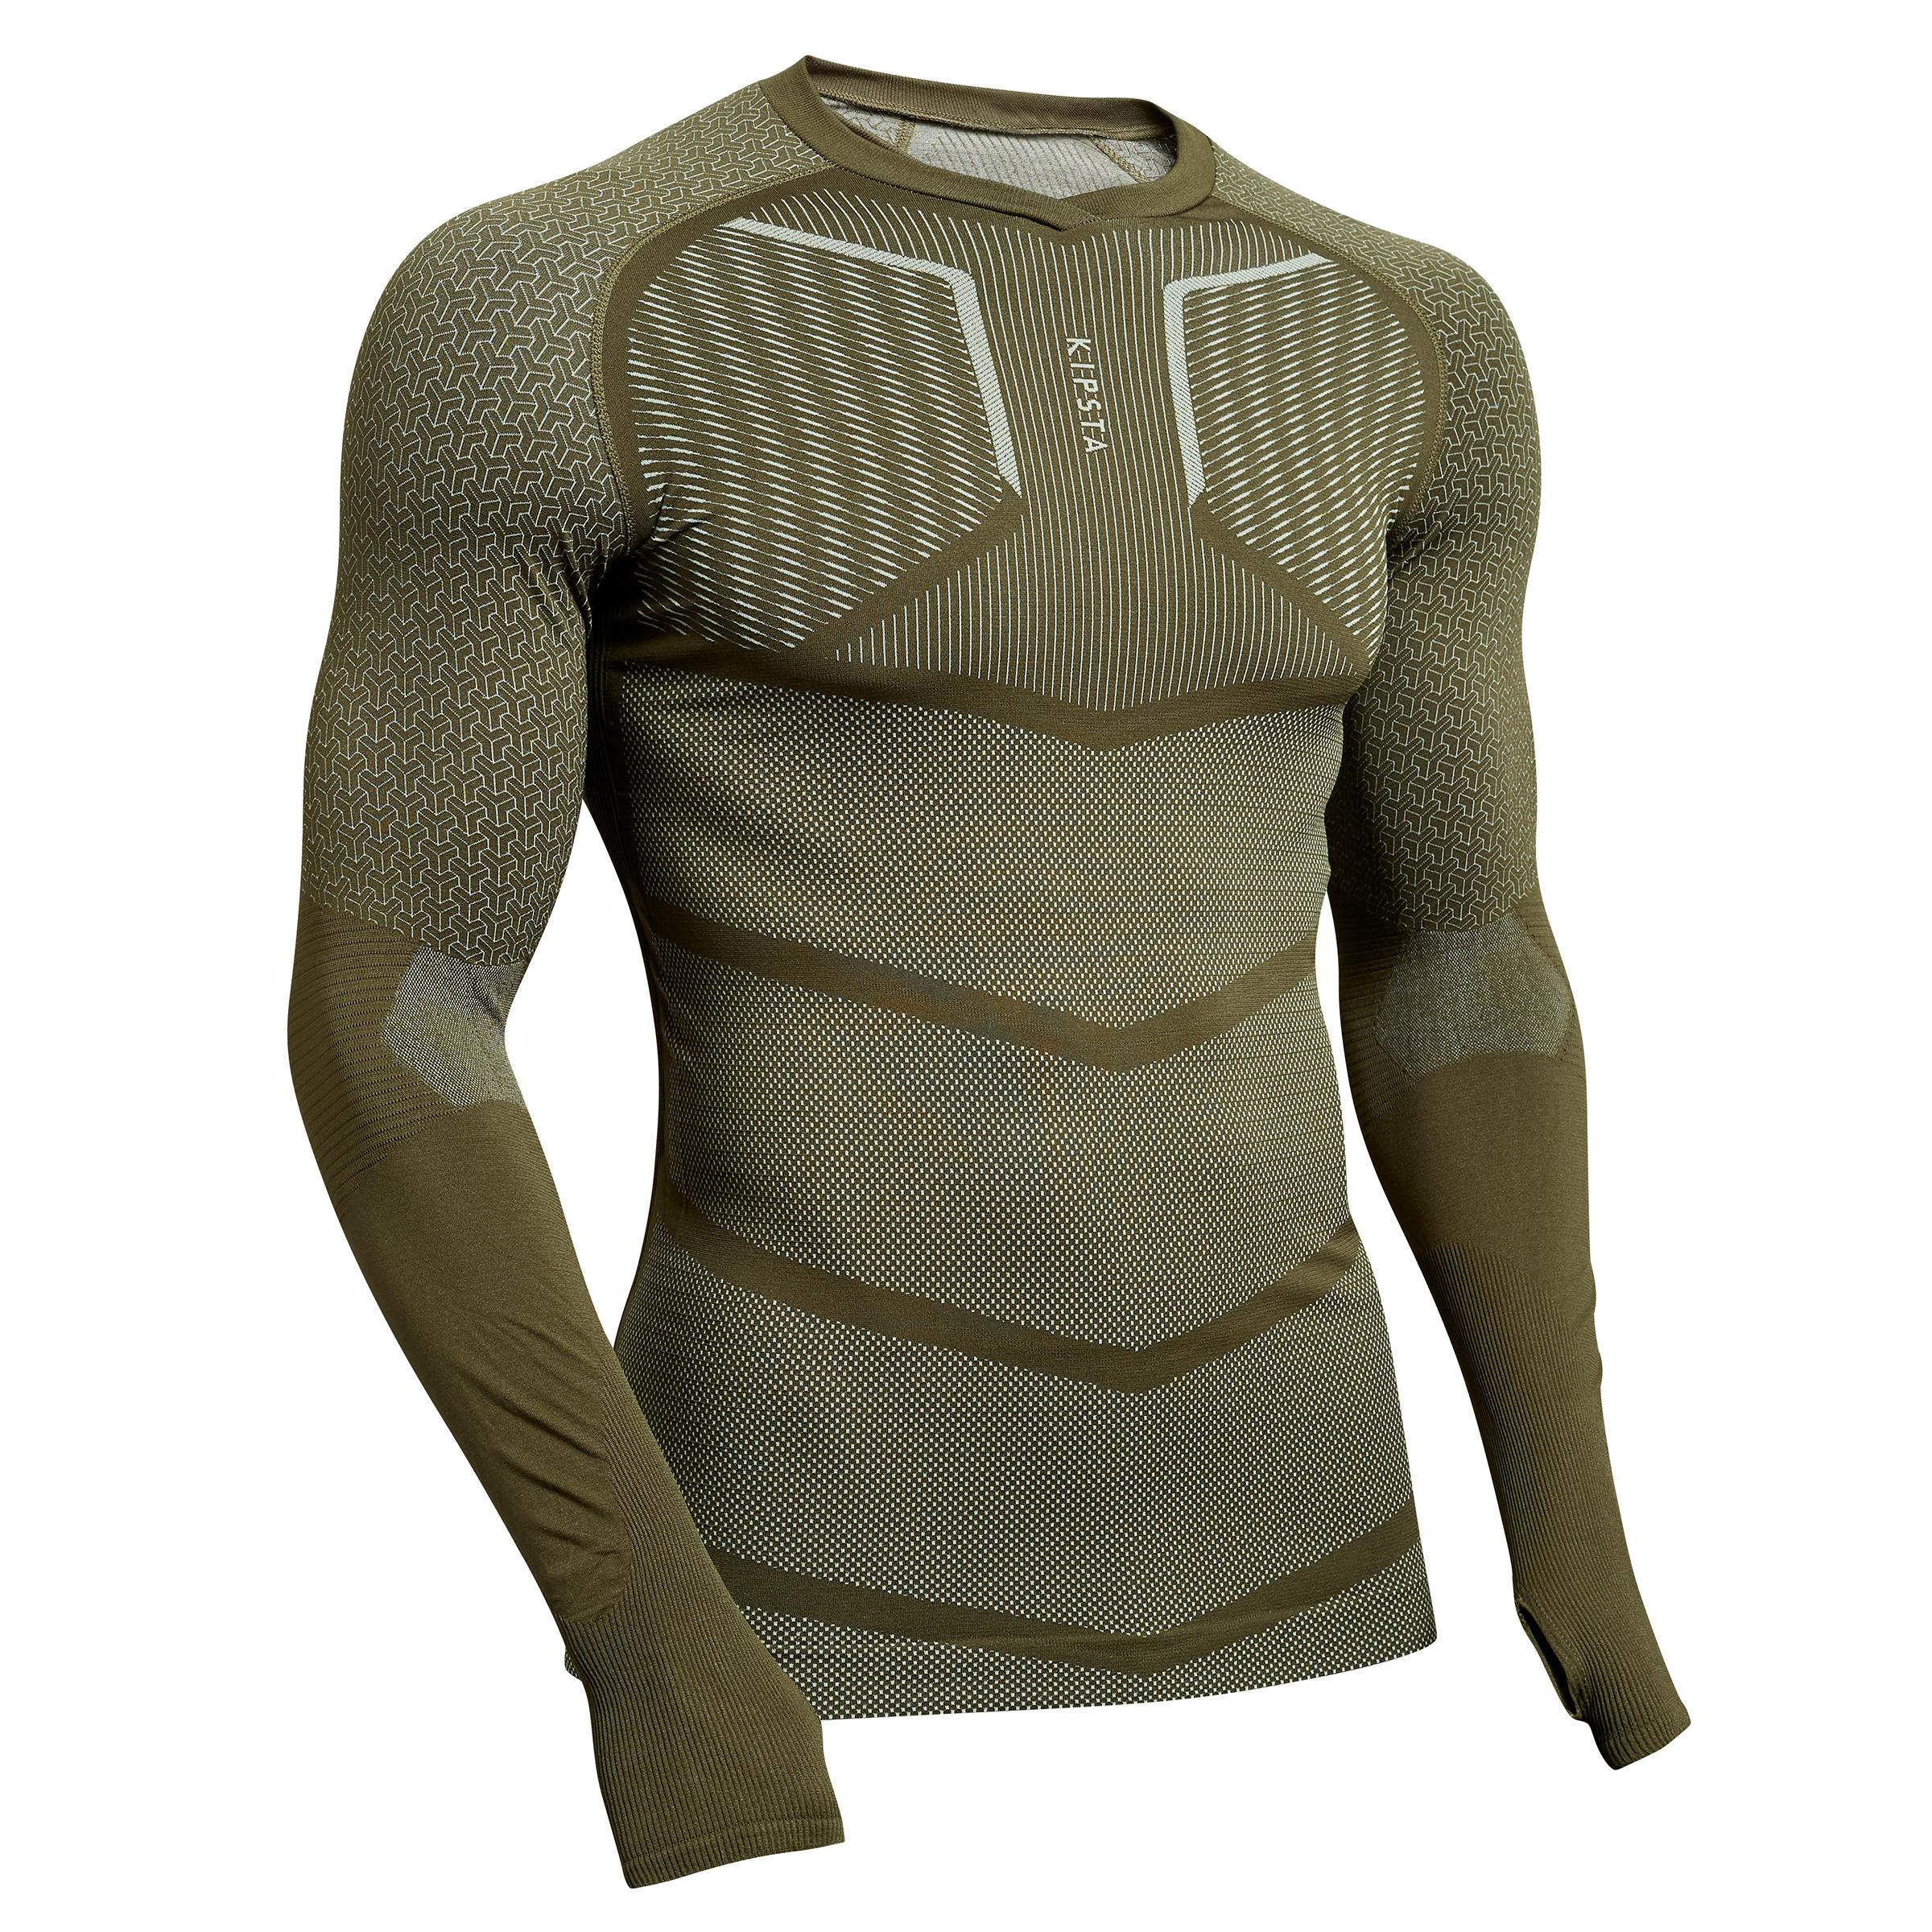 Funktionsshirt langarm Keepdry 500 atmungaktiv Erwachsene khaki | Bekleidung > Shirts > Funktionsshirts | Grün - Khaki | Kipsta